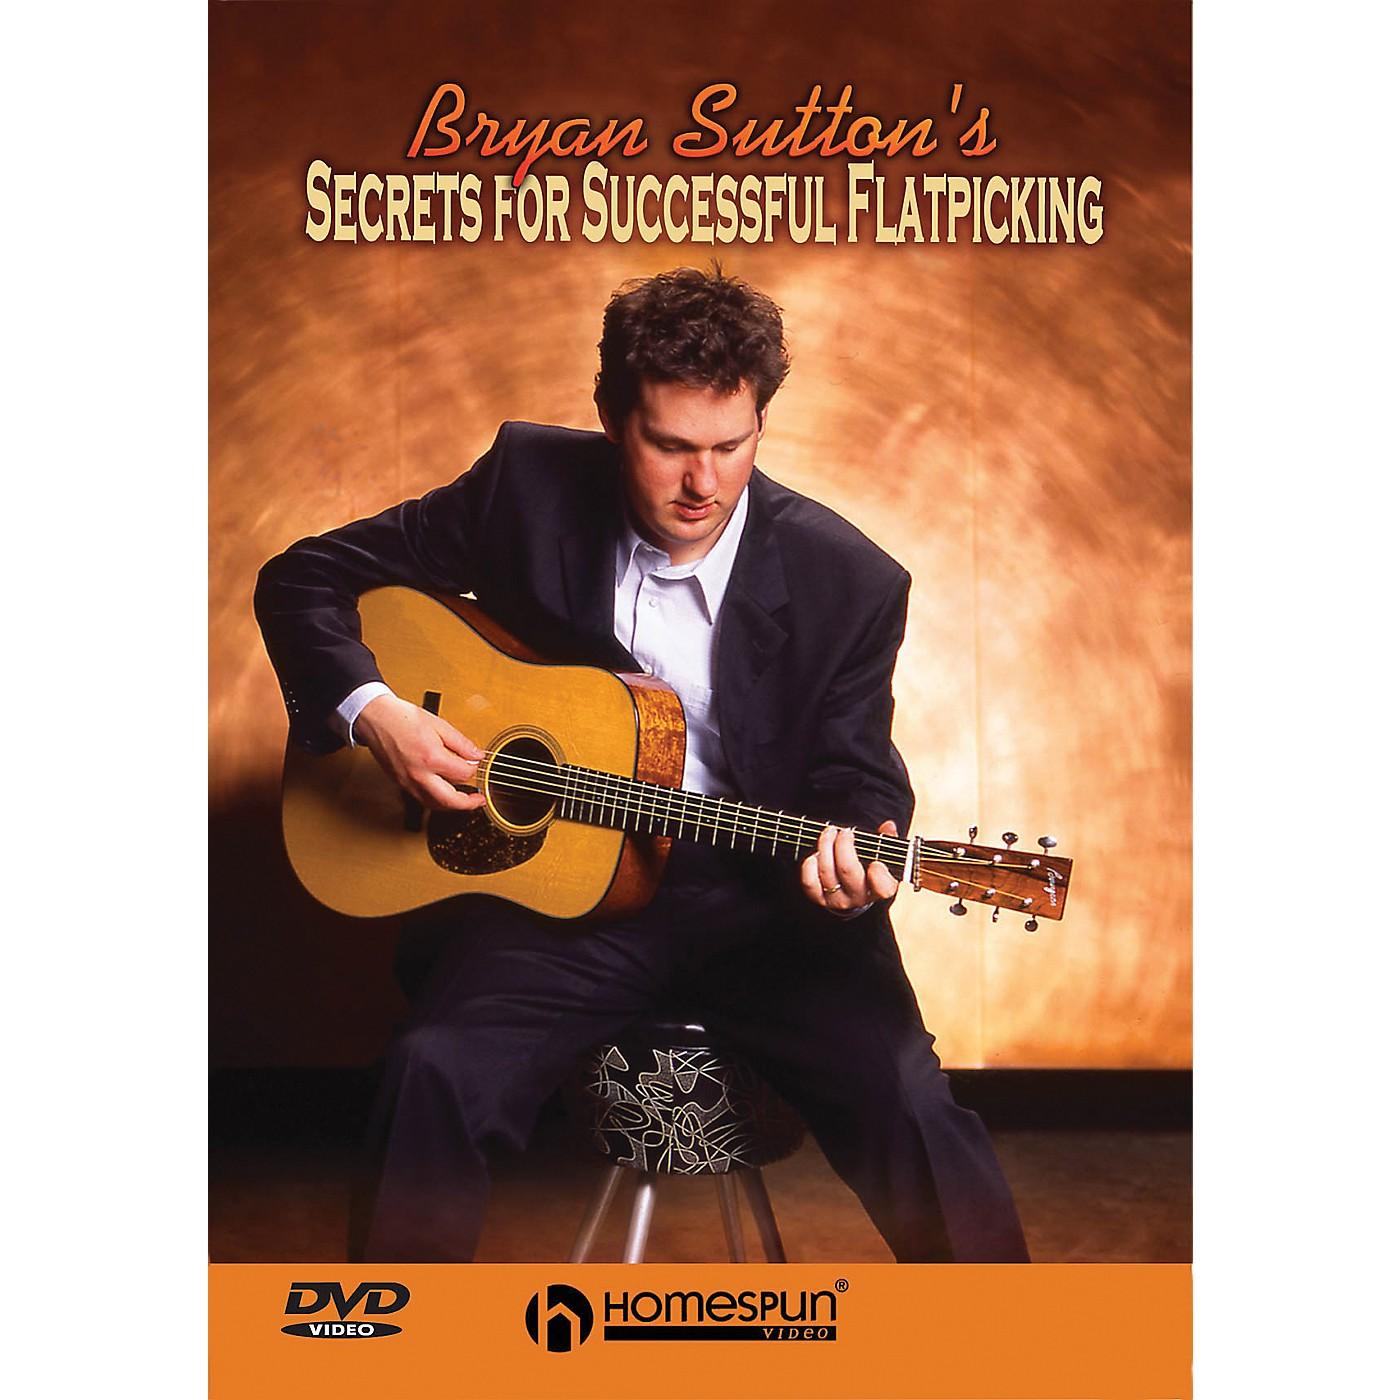 Homespun Secrets for Successful Flatpicking (DVD) thumbnail